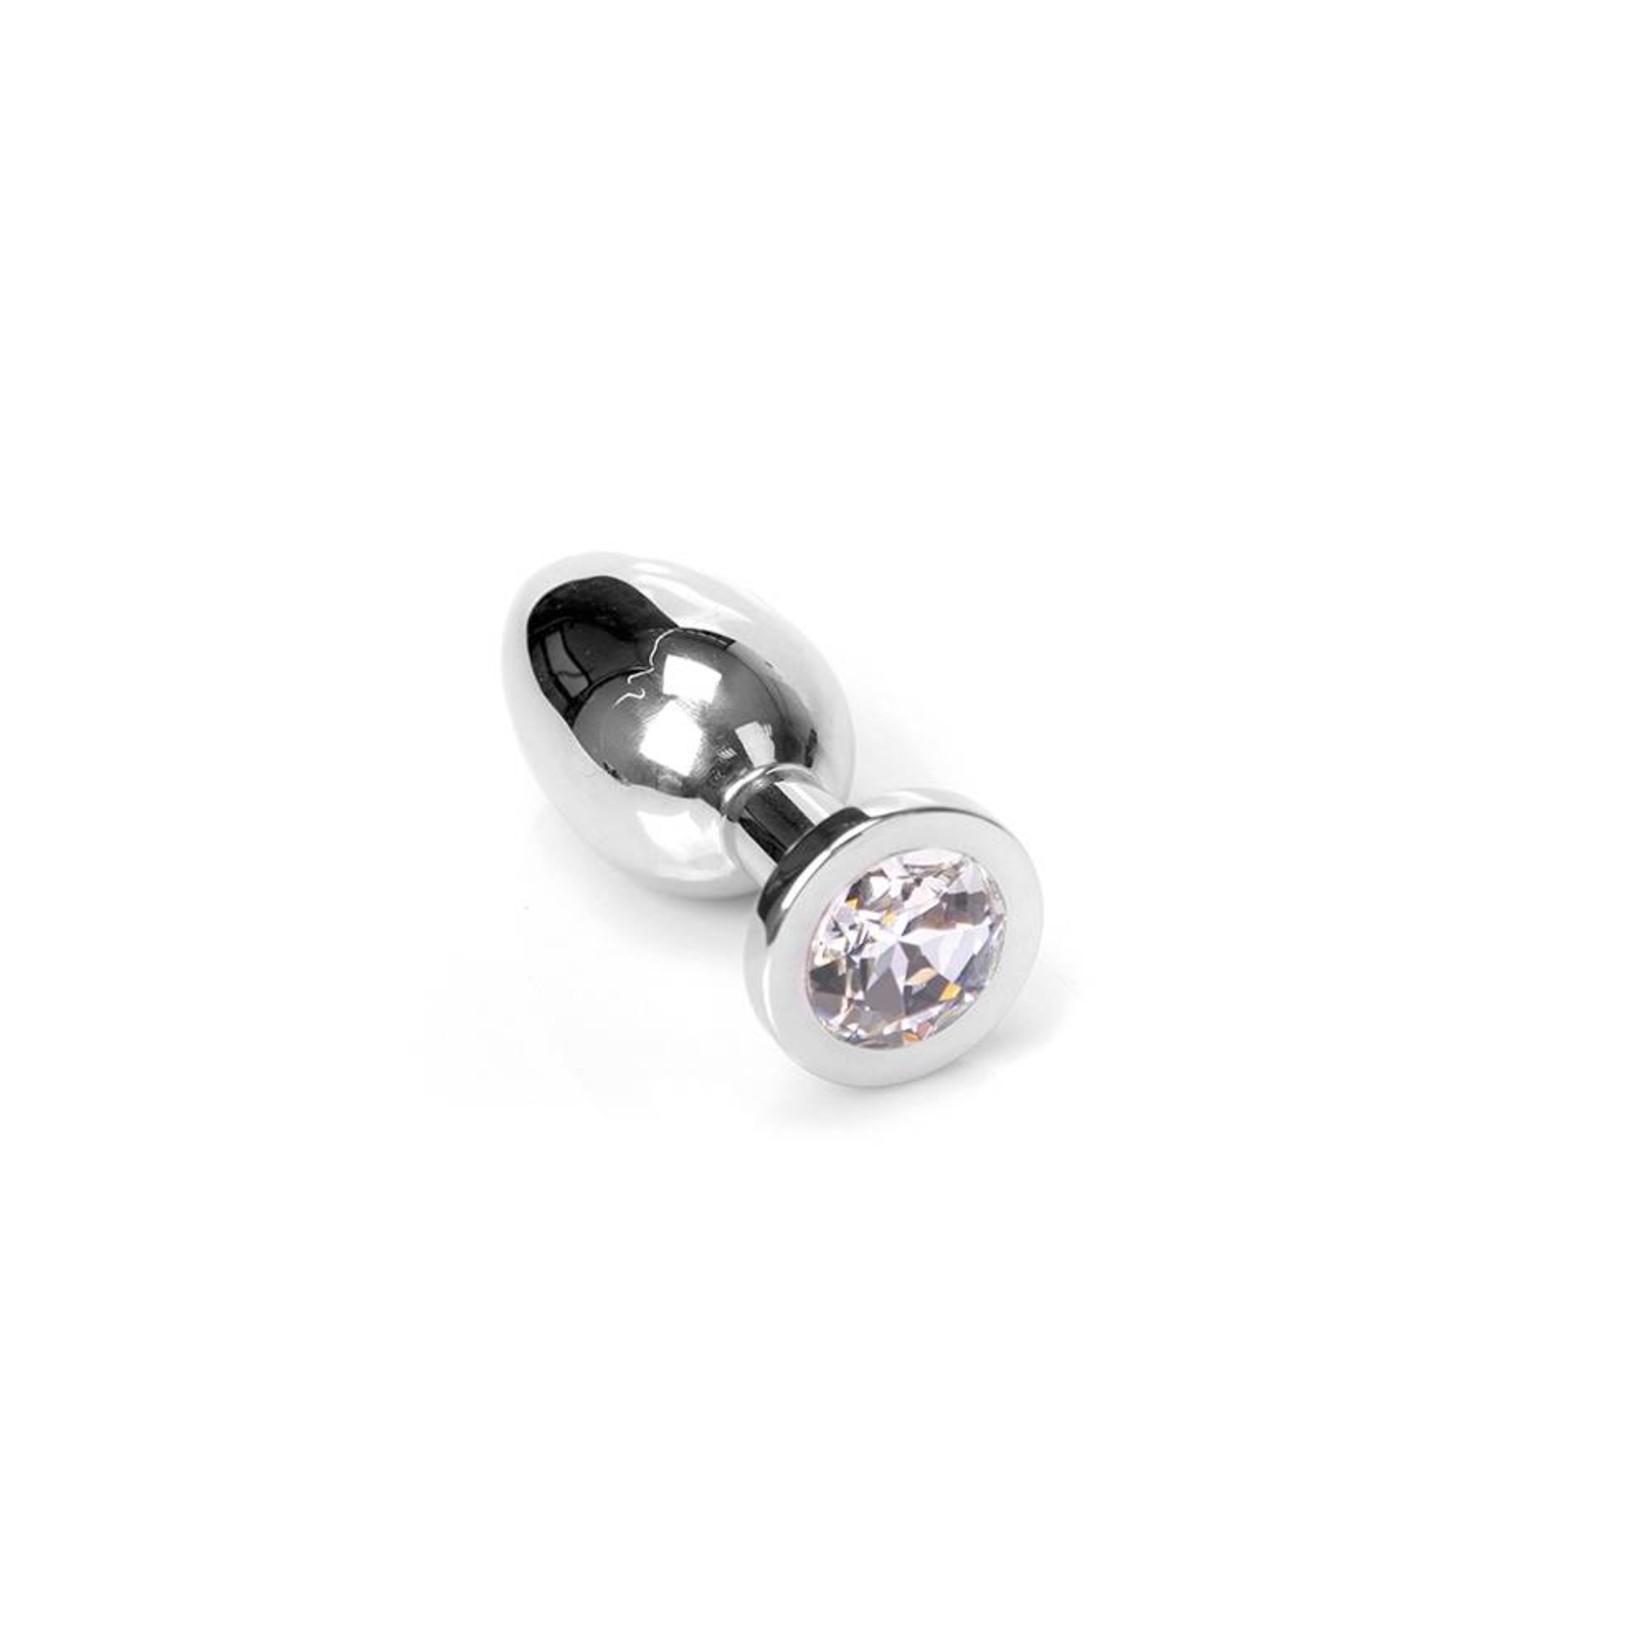 KIOTOS Bizarre Kiotos Bizarre - Buttplug with Diamond - Medium Clear